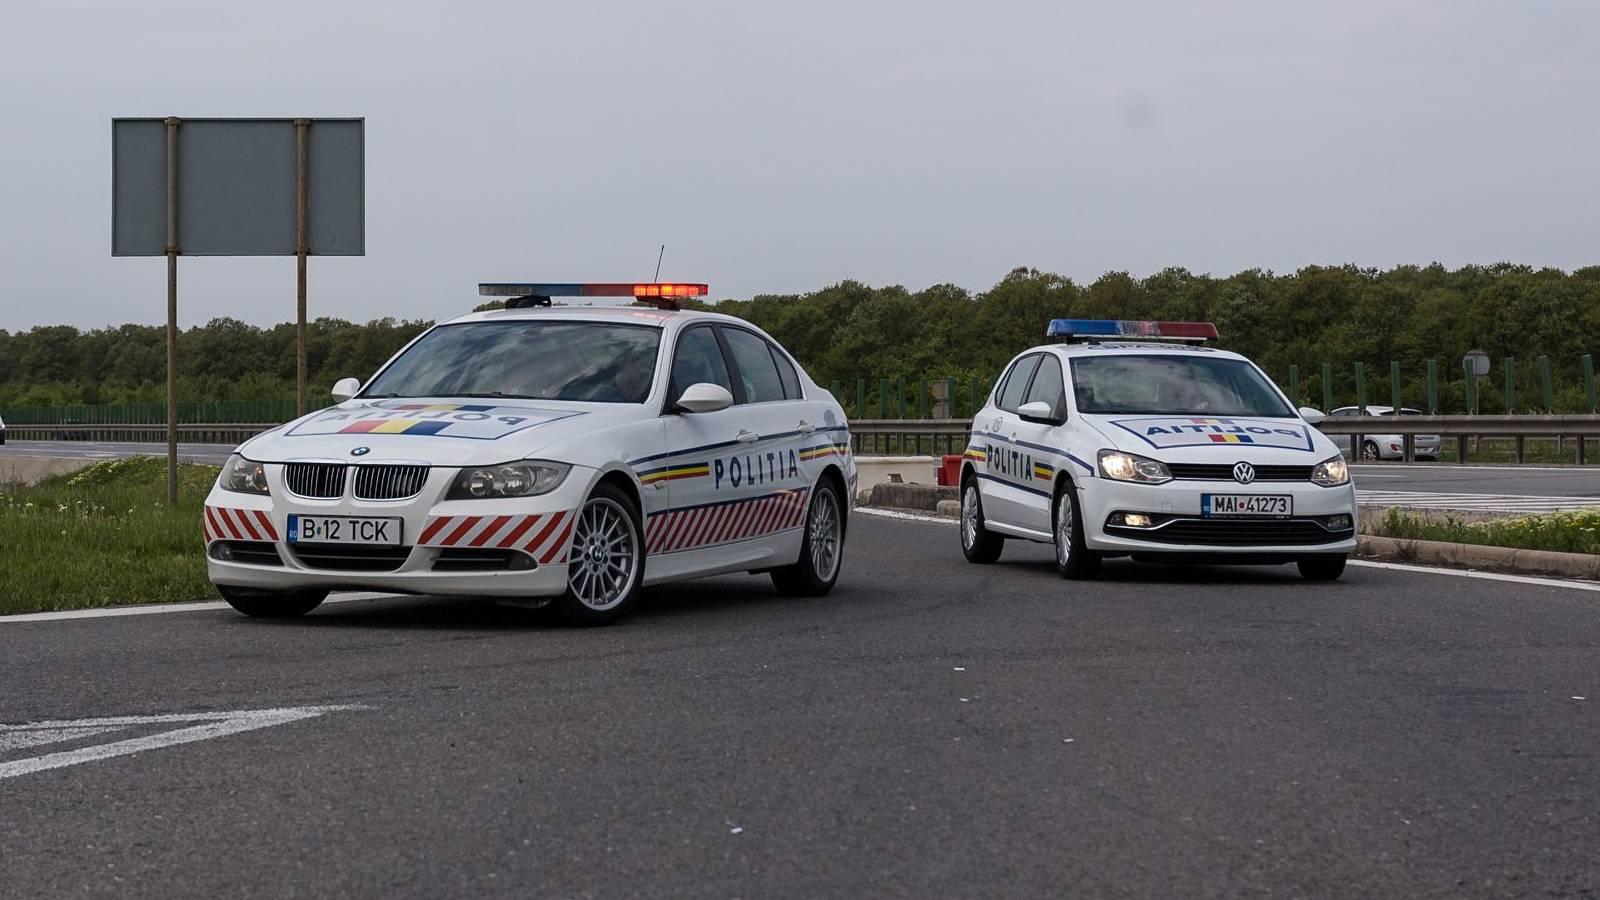 Politia Romana autostrada radar